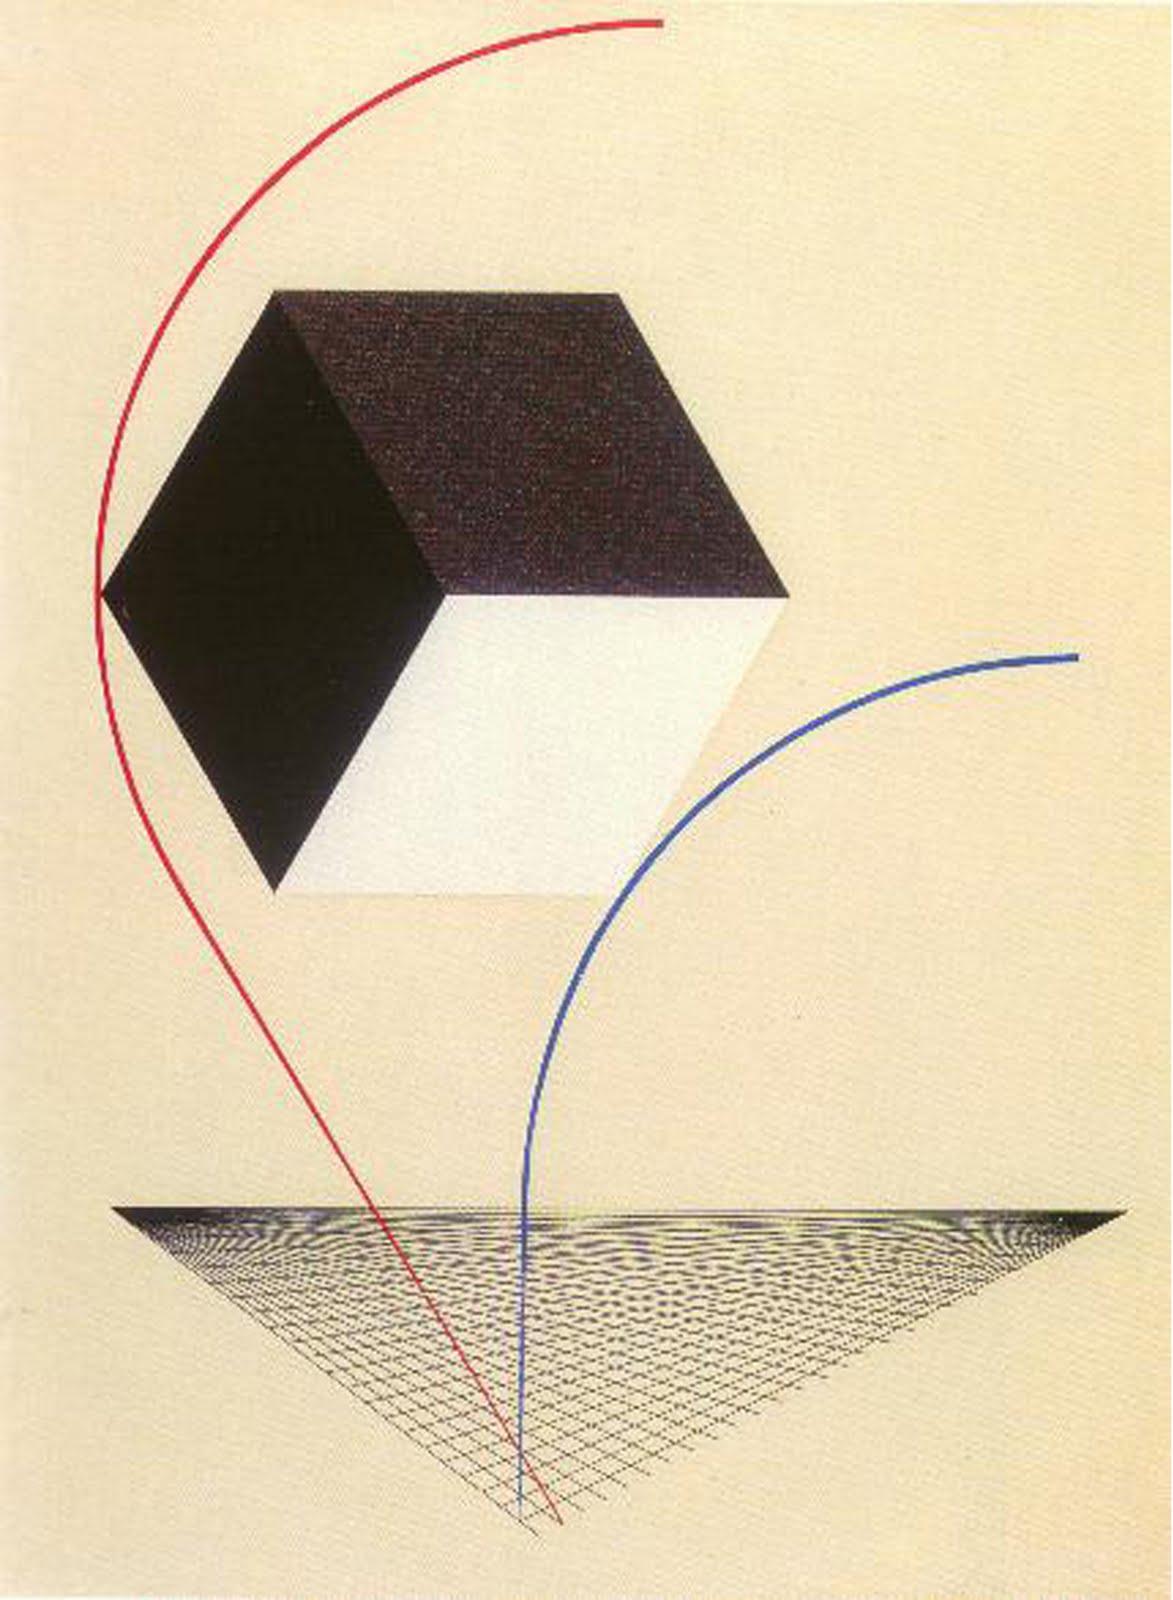 Proun - El Lissitzky - WikiArt.org